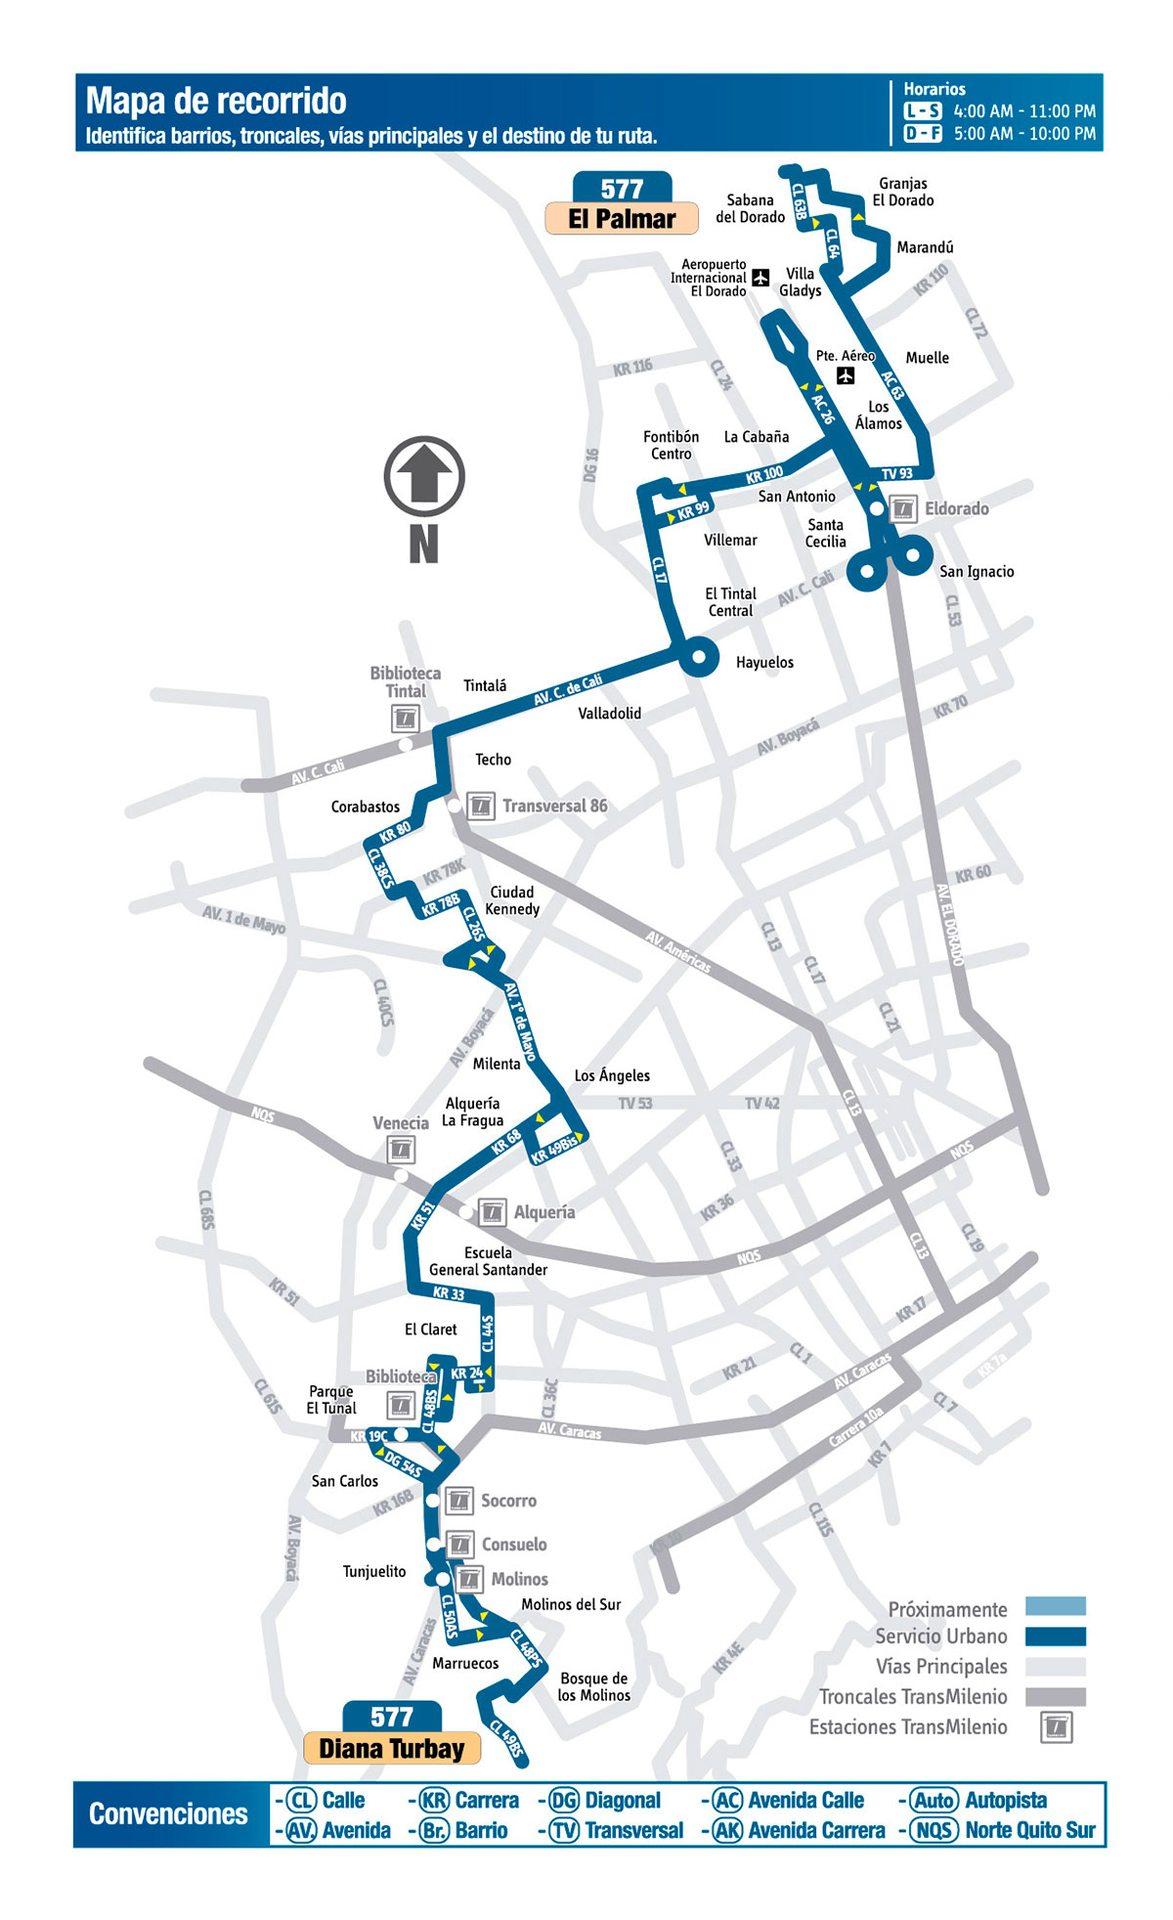 Ruta SITP: 577 El Palmar ↔ Diana Turbay [Urbana] 4